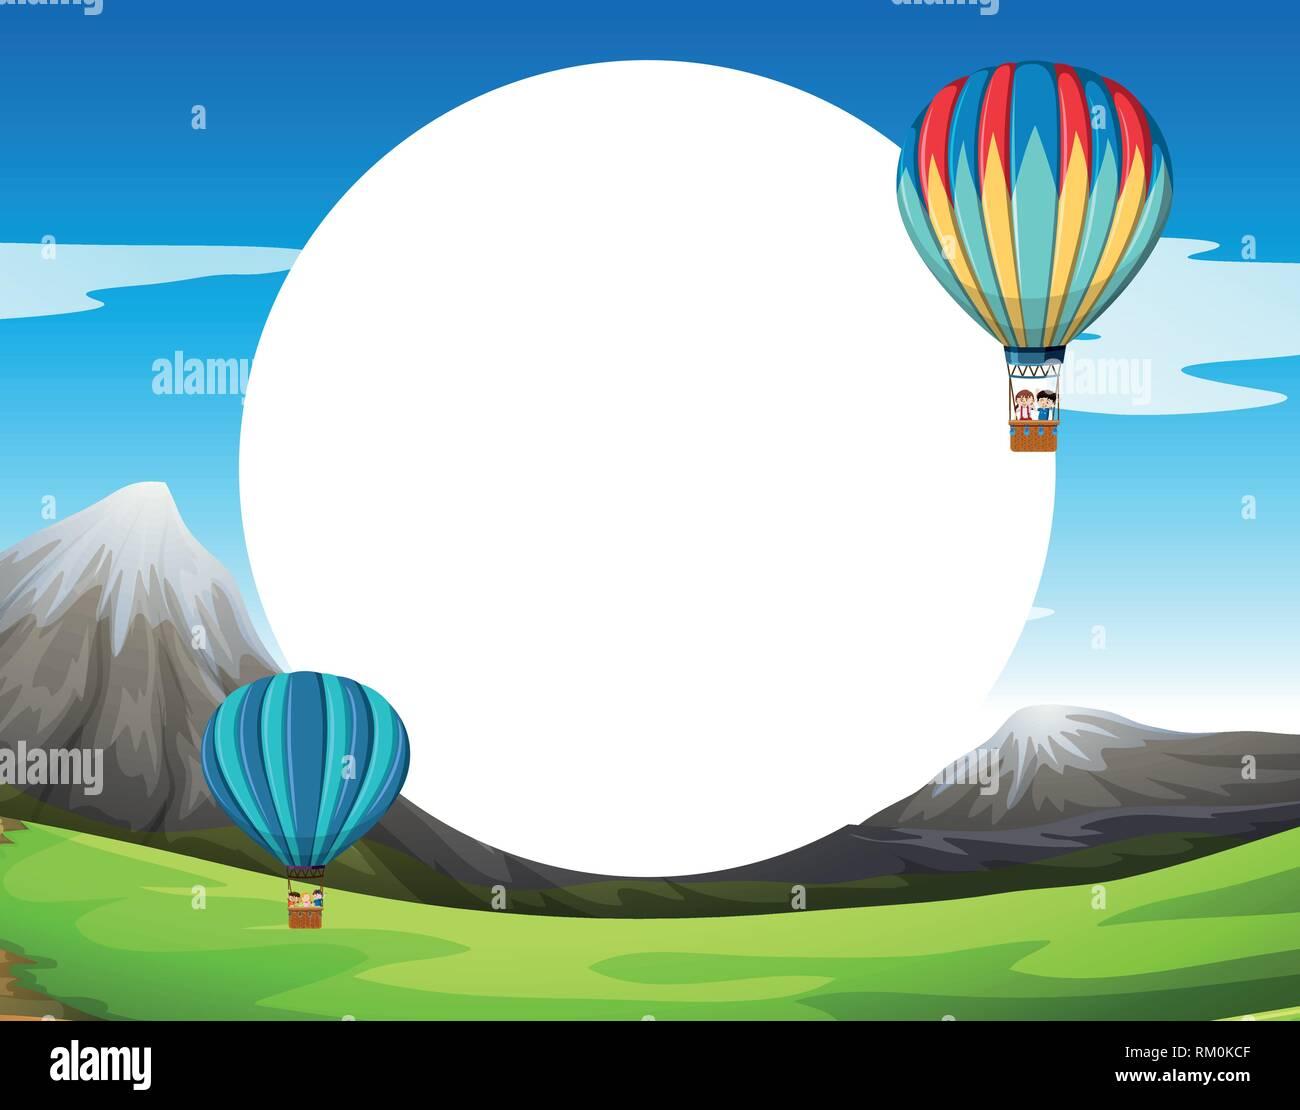 Ein Heißluftballon Vorlage Abbildung Vektor Abbildung Bild